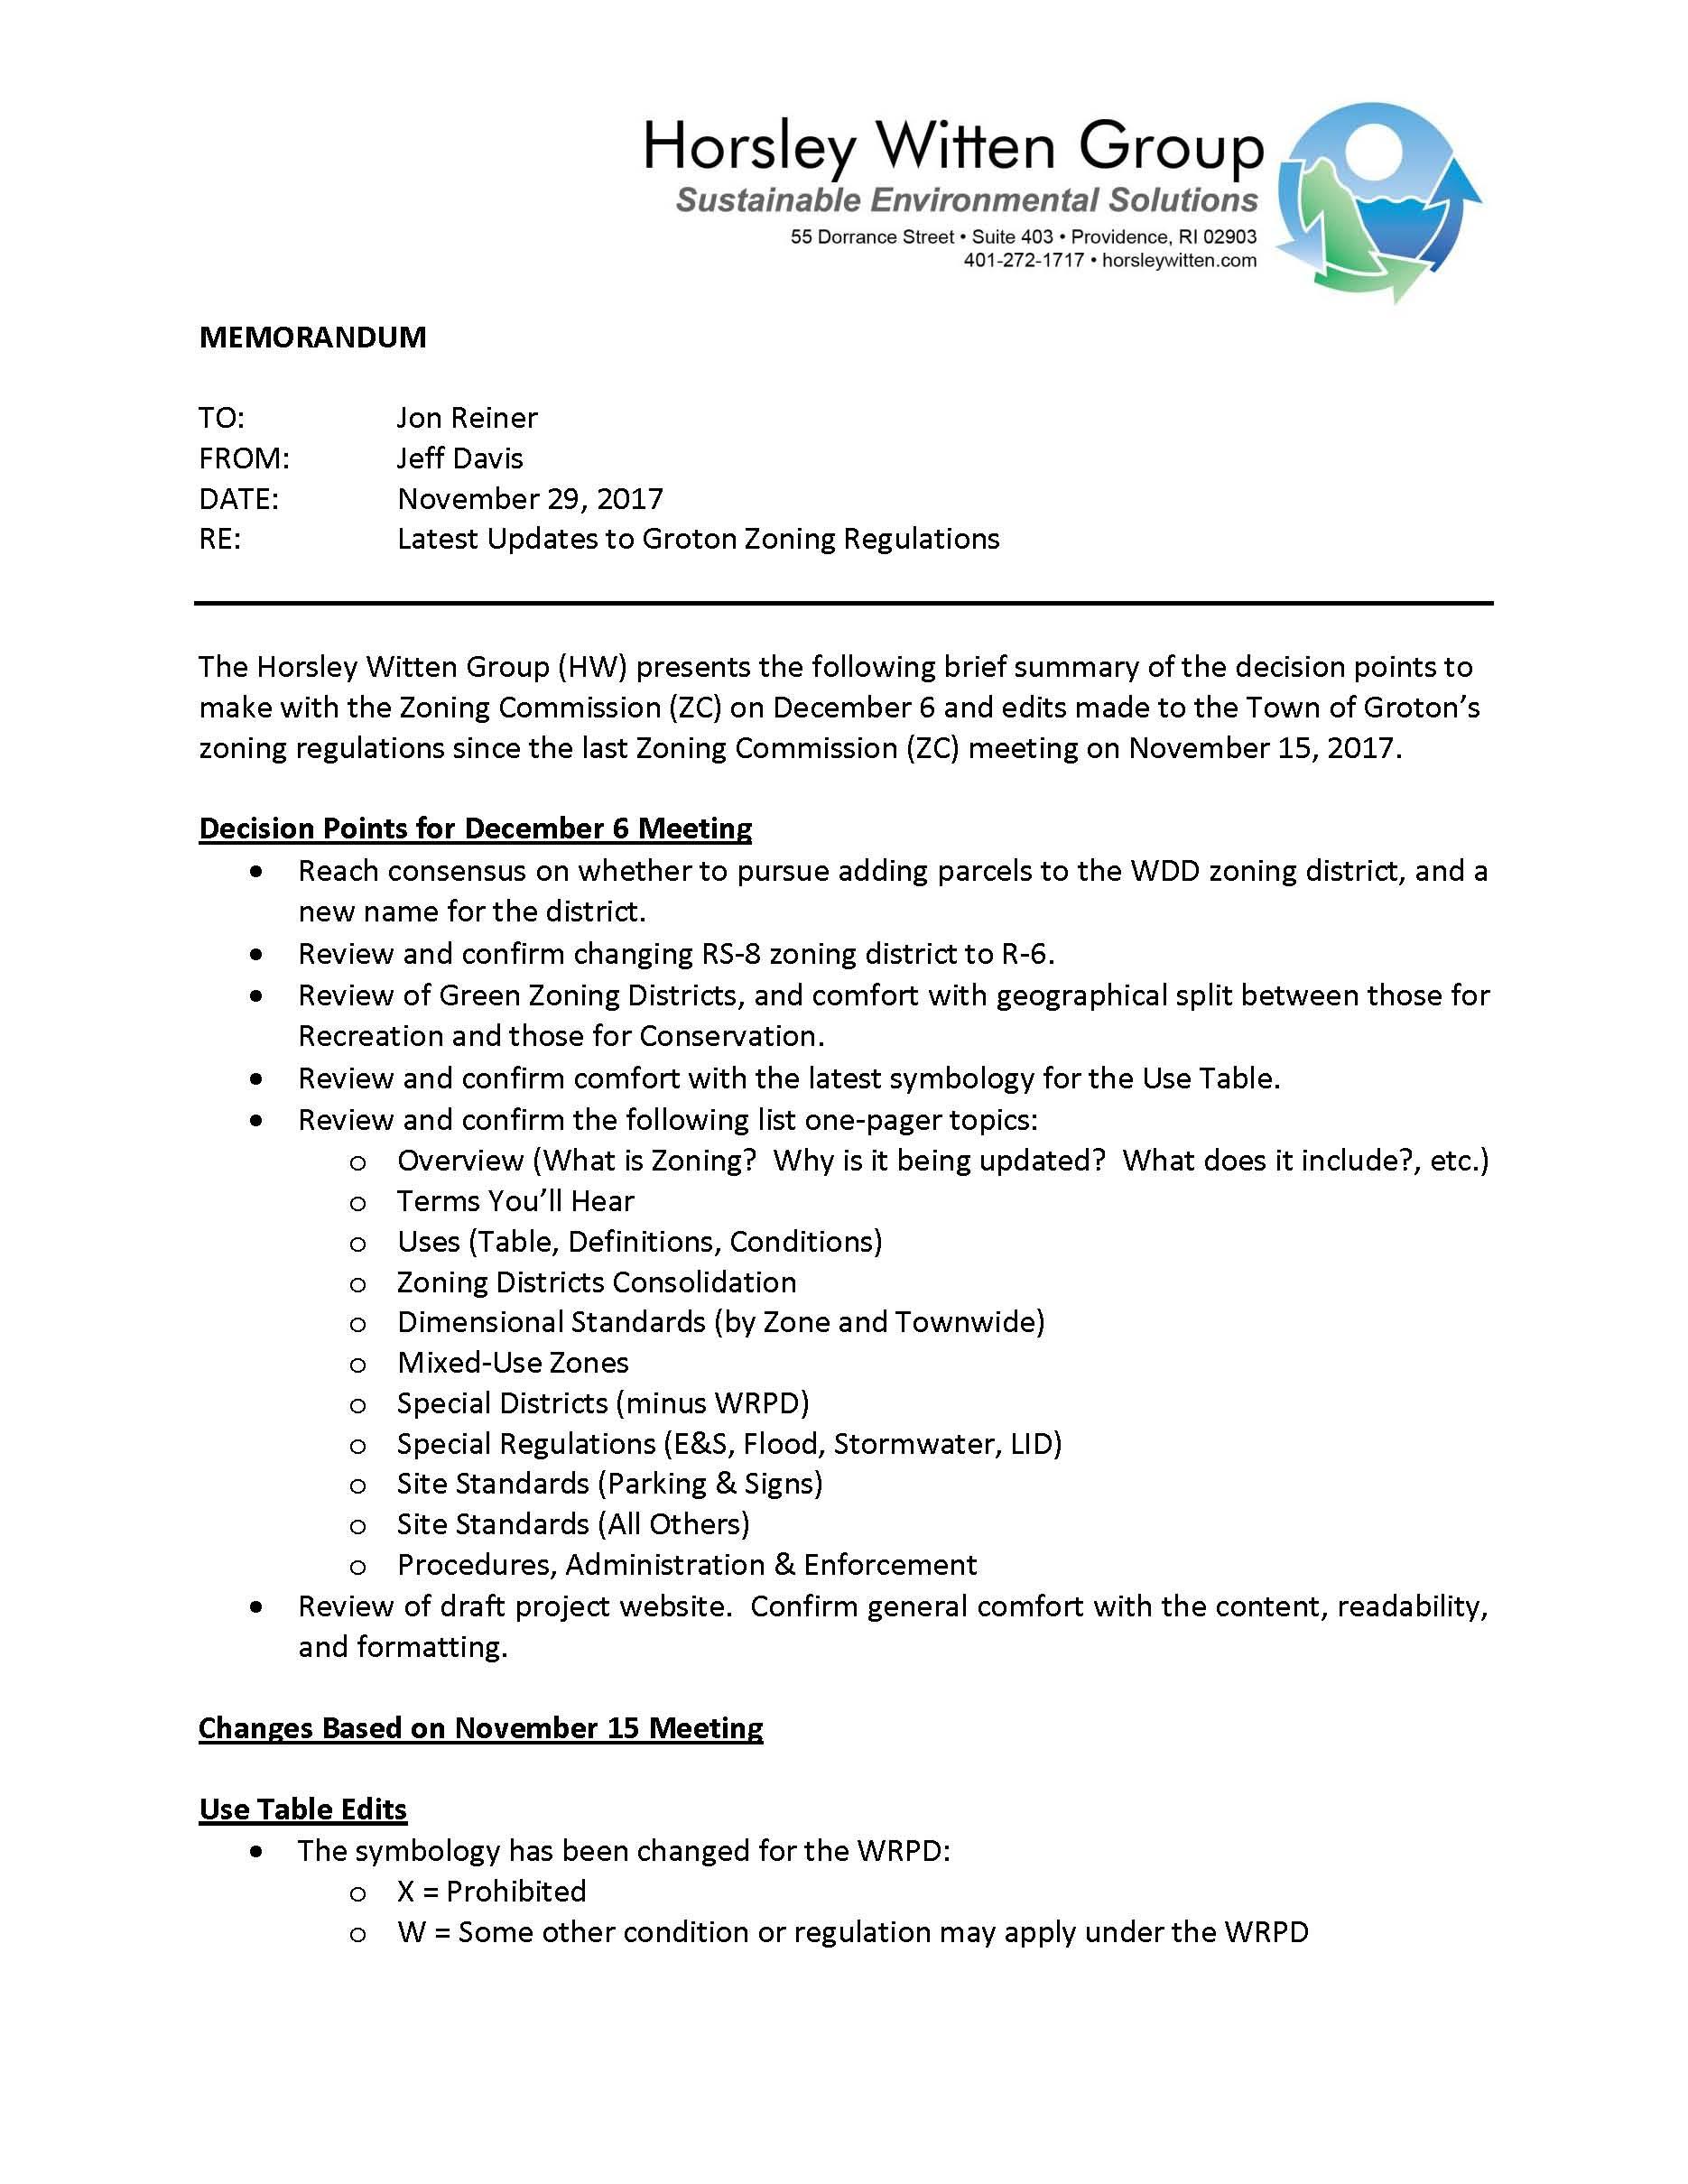 ZCMtg_Memo_16156 staff _Page_1.jpg